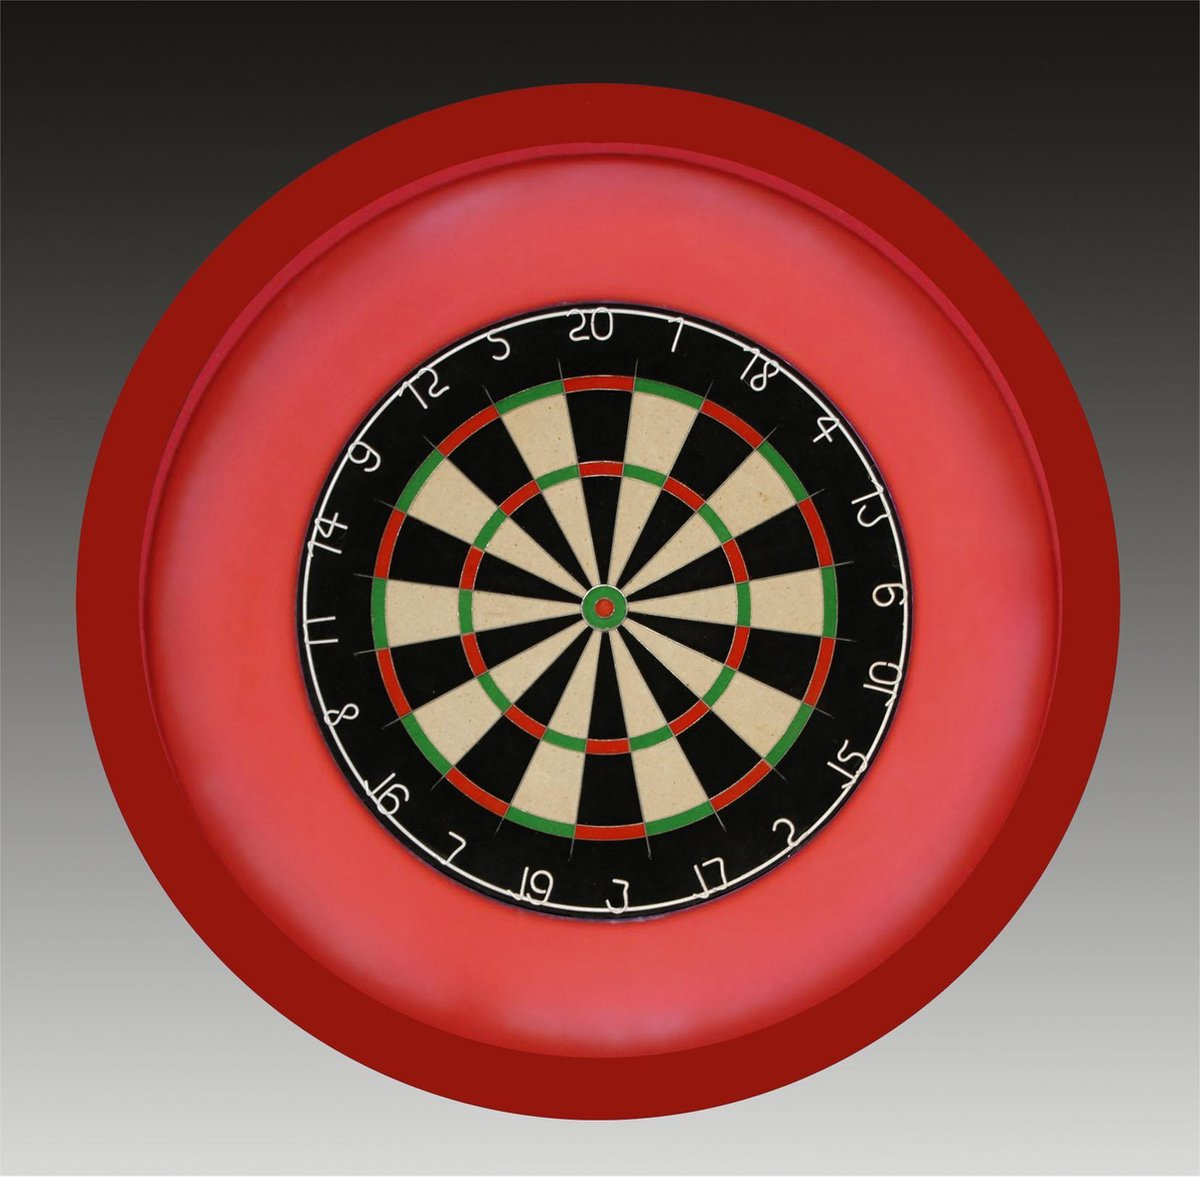 TCB XXL - Dartbord Verlichting Complete Combiset inclusief - dartbord - inclusief - dartboard surround - rood